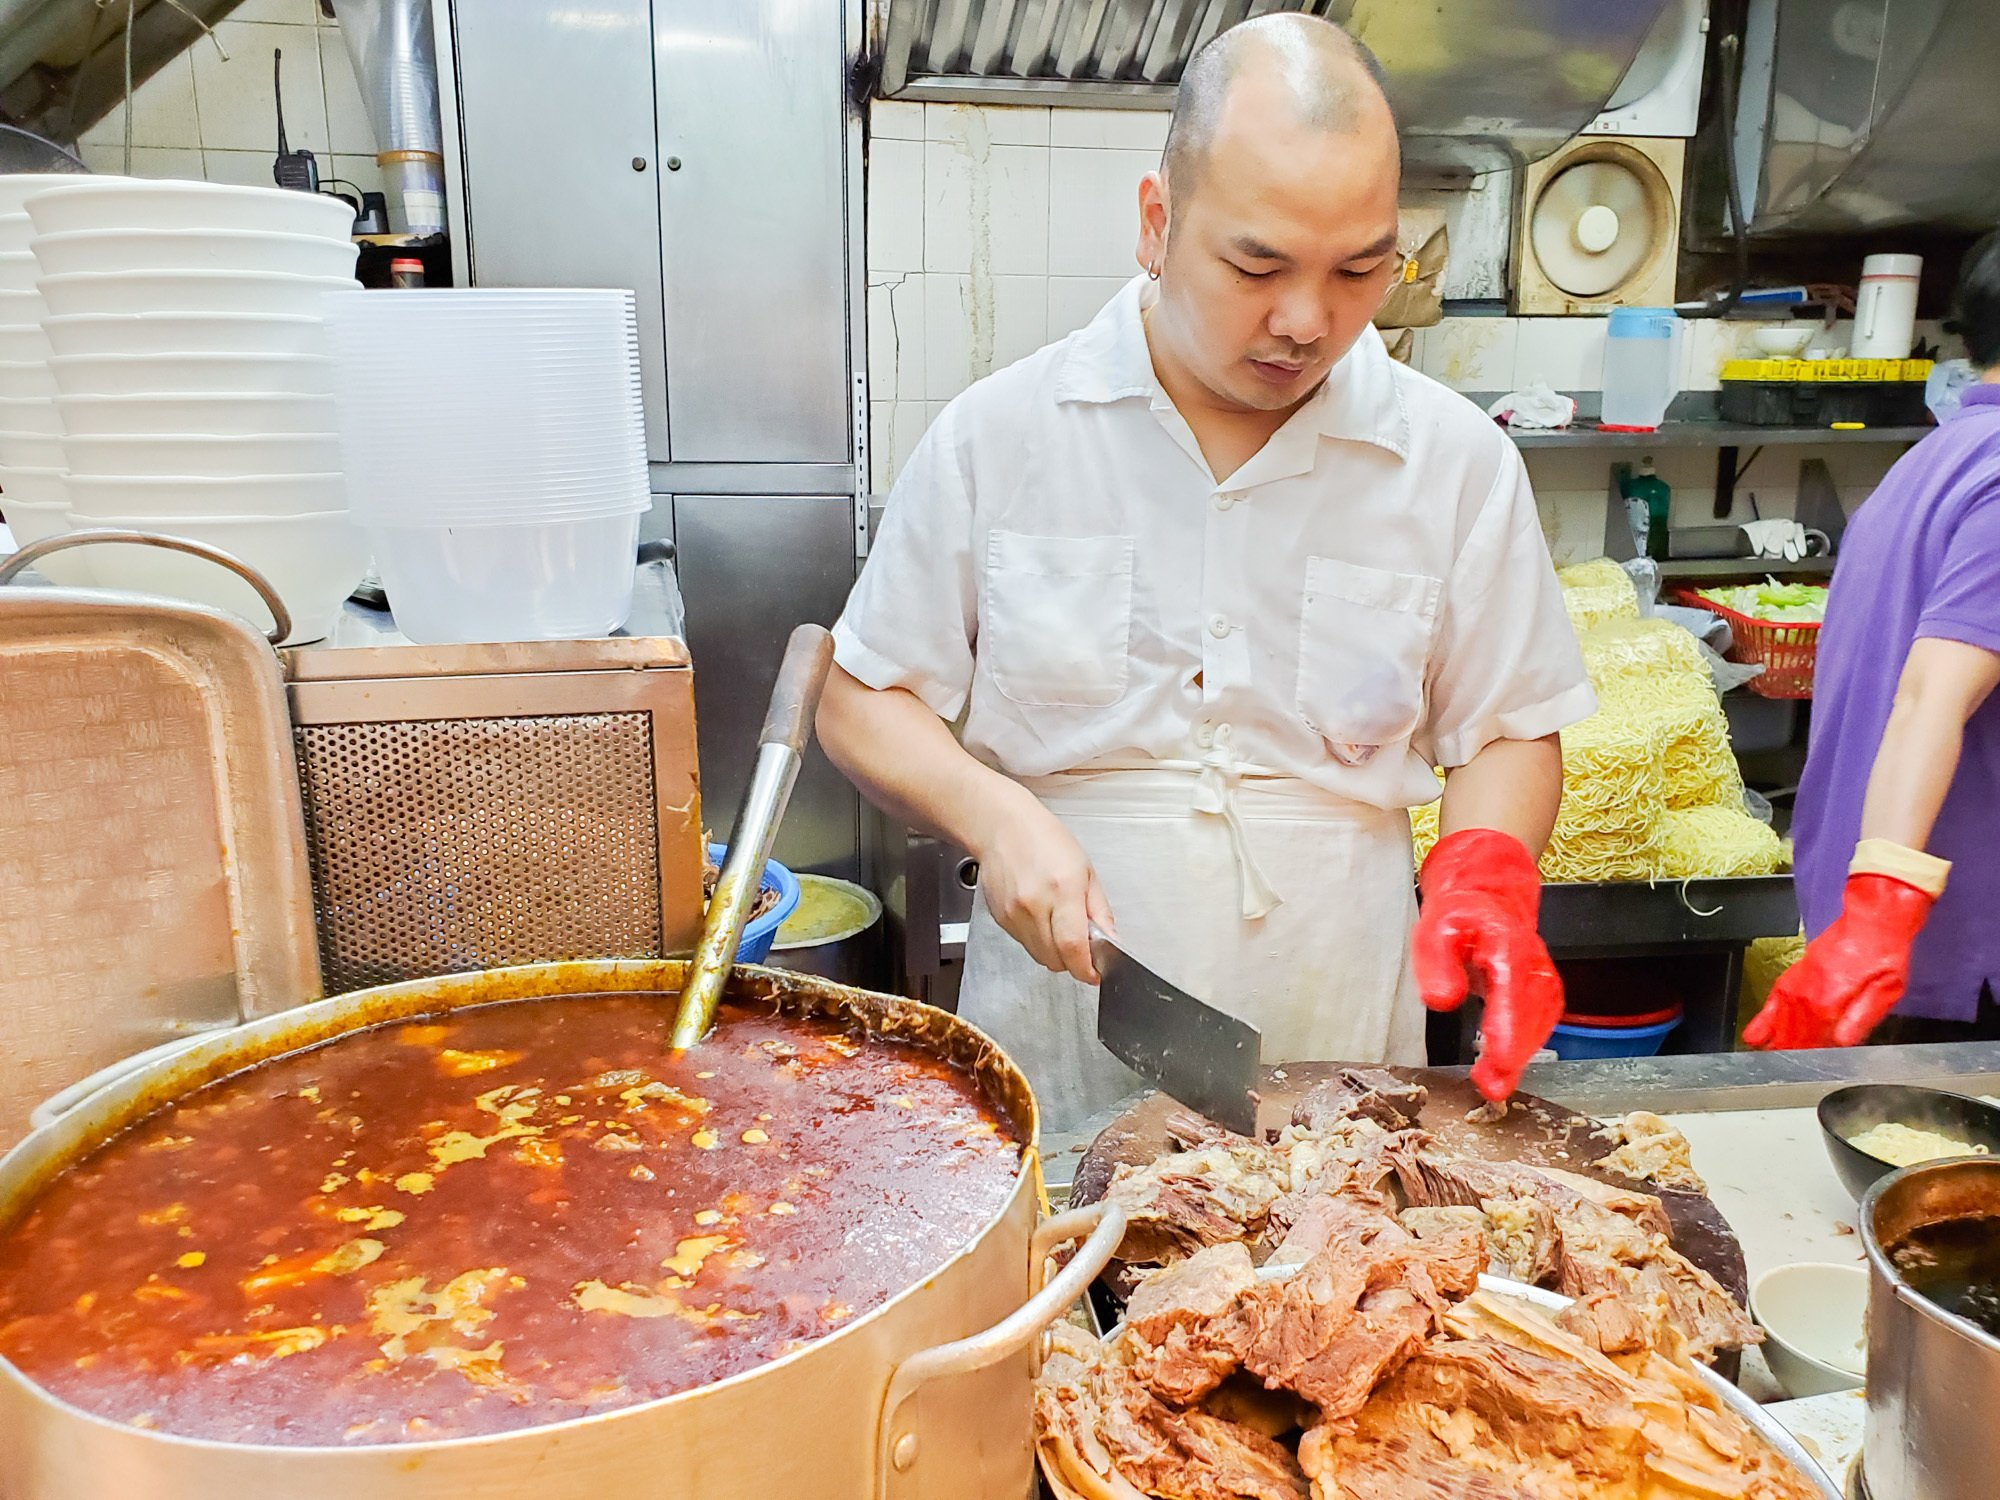 the best beef brisket noodles in hong kong at kau kee food cafe 九記牛腩